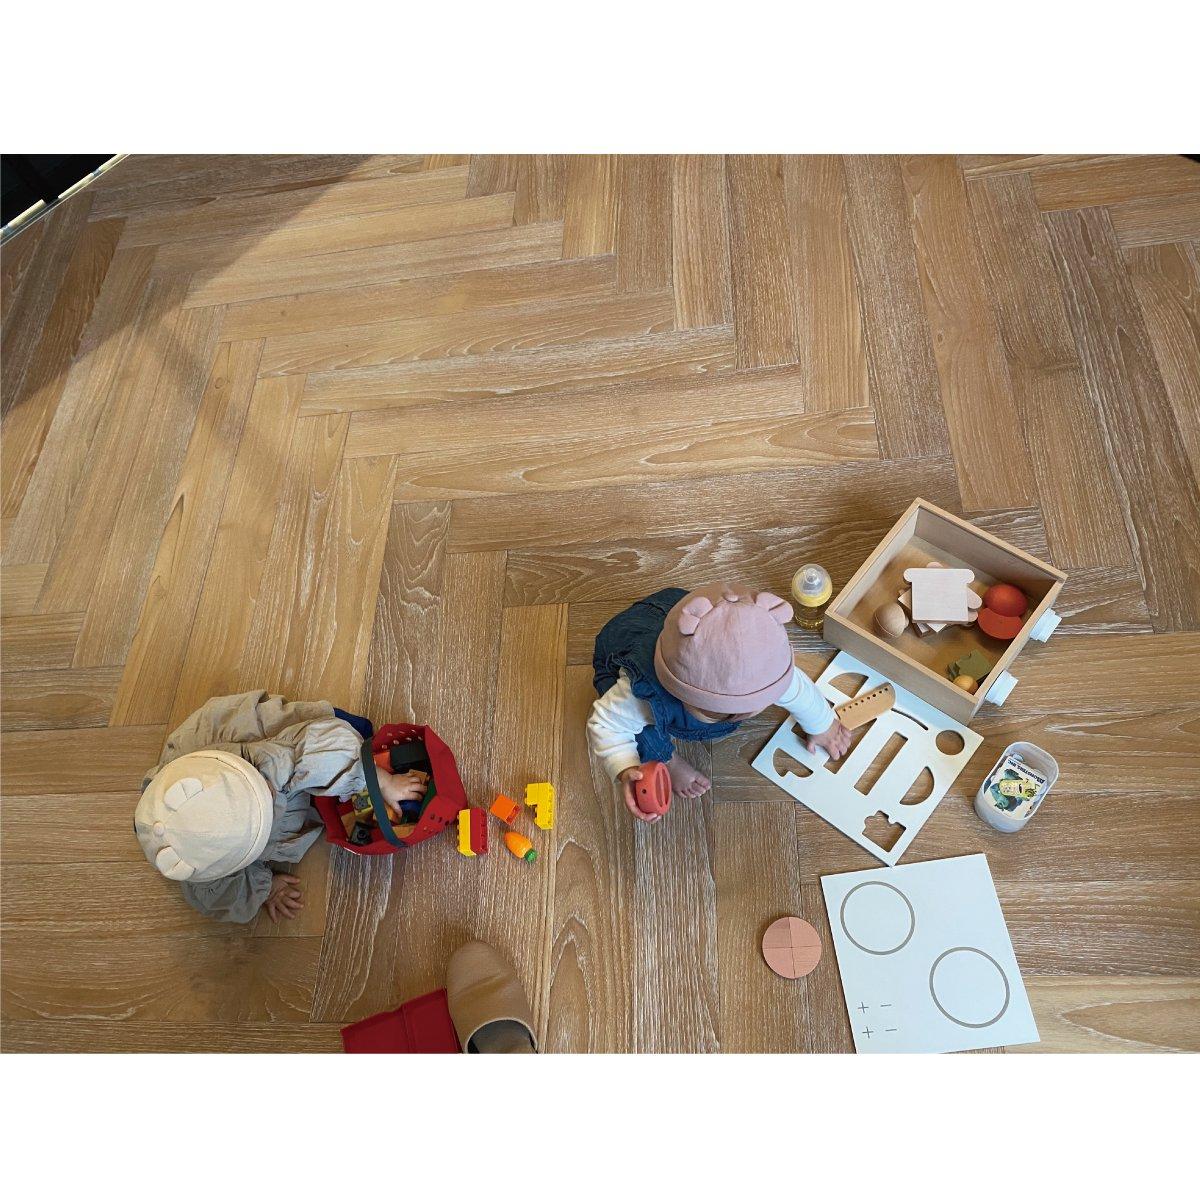 【BABY】Baby Linen Bear Cap 詳細画像14